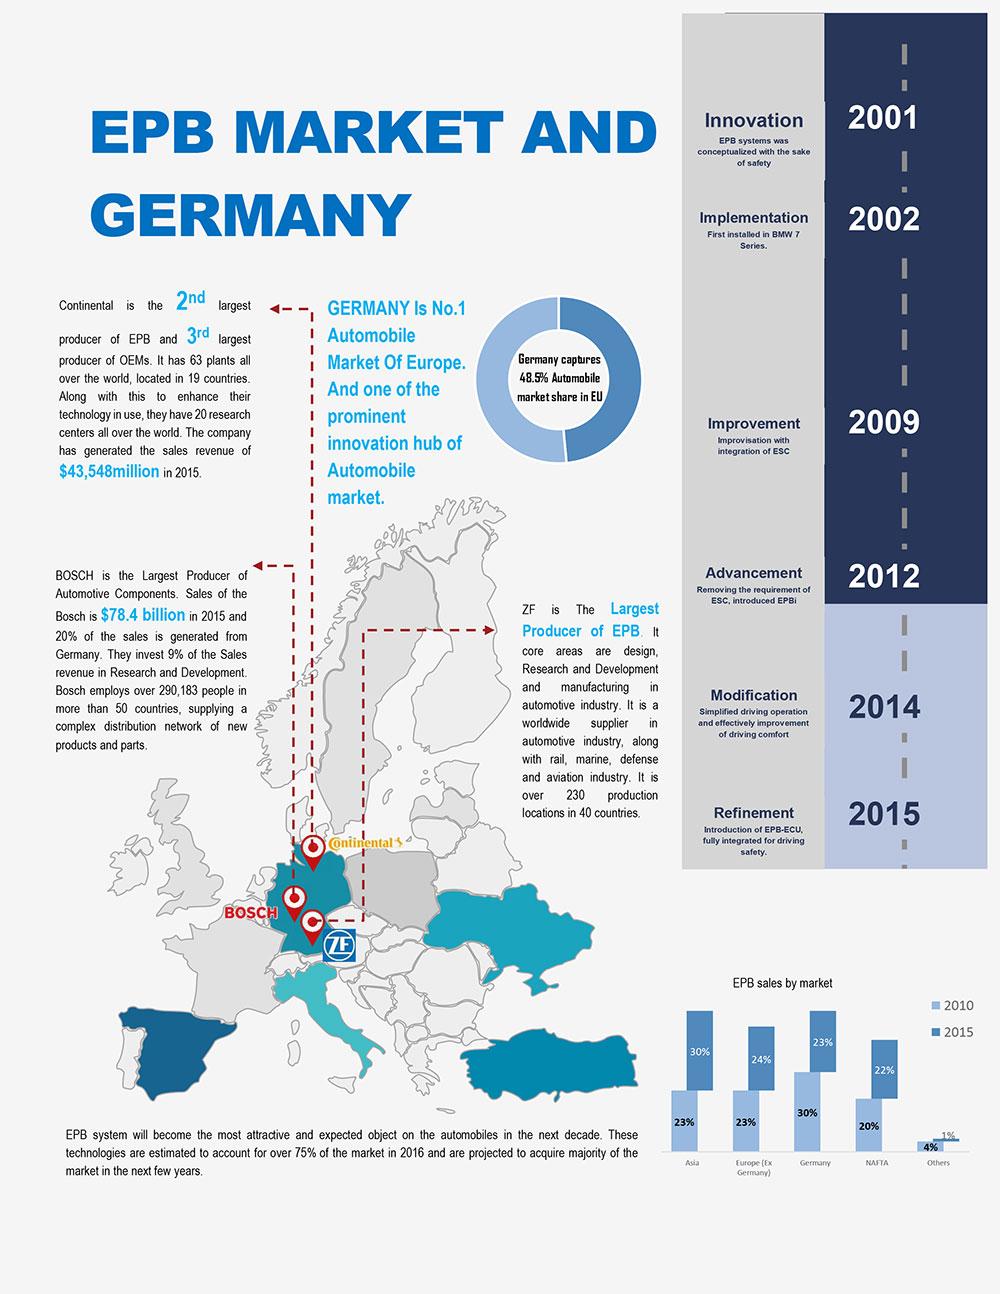 Electronic-Parking-Break-and-Shaft-Market-Scenario-in-Germany-2